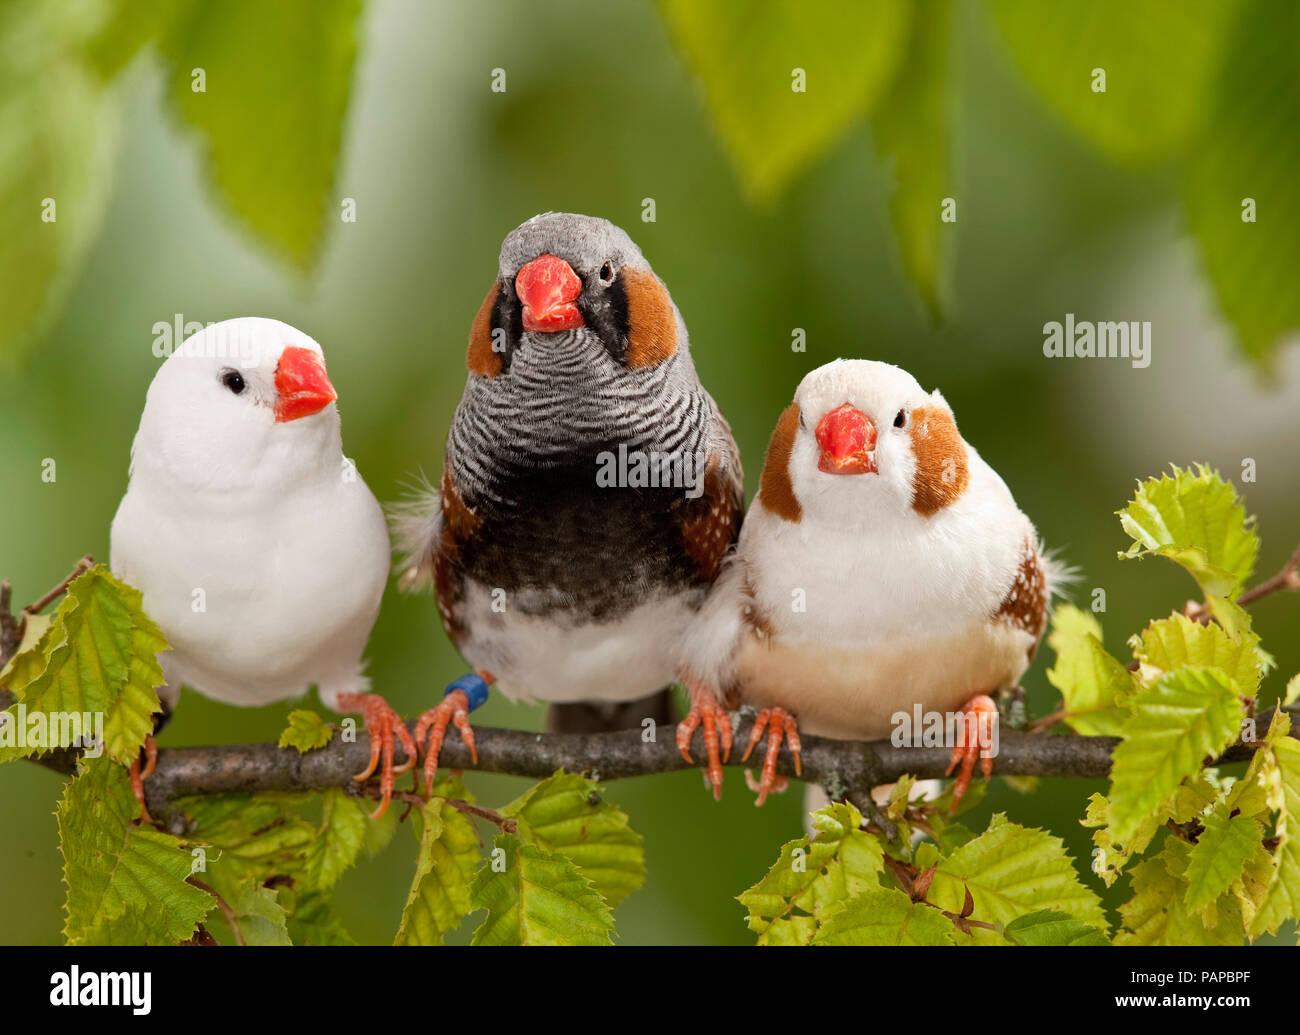 Zebra Finch (Taeniopygia guttata). Three adult birds perched on a twig. Germany - Stock Image